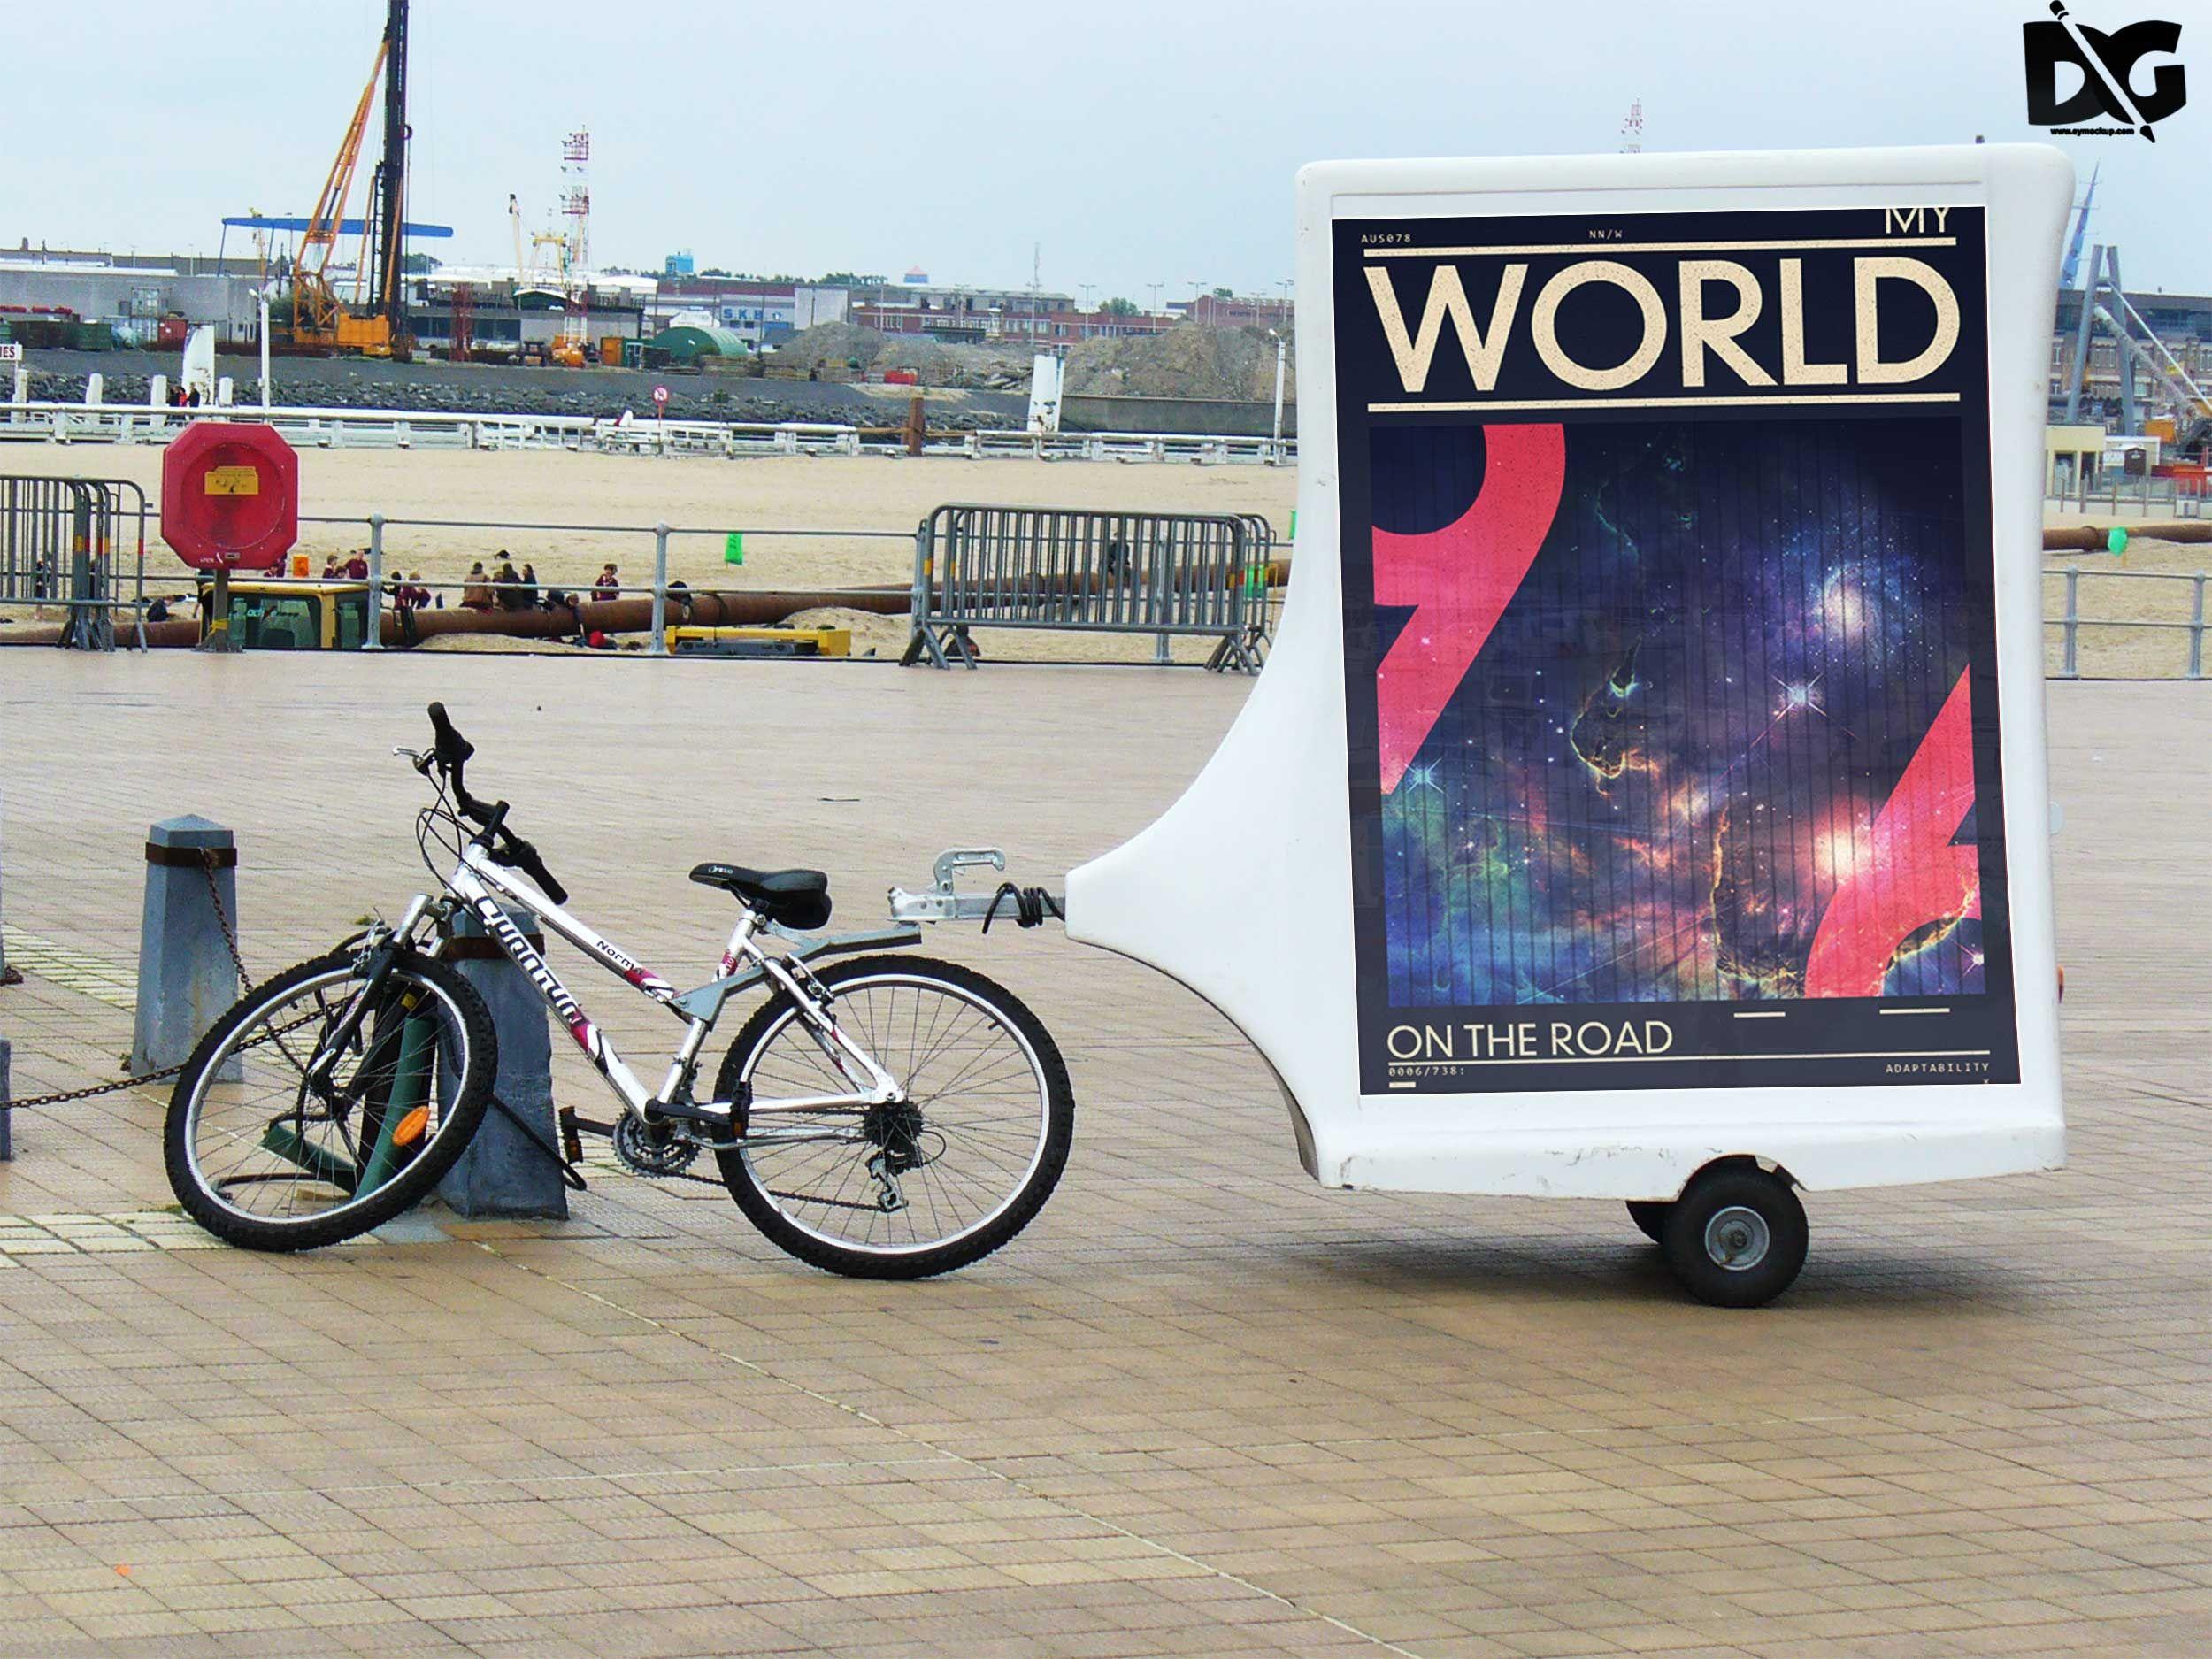 Download Free Psd Bicycle Billboard Design Mockup Mockup Free Psd Mockup Design Free Logo Psd